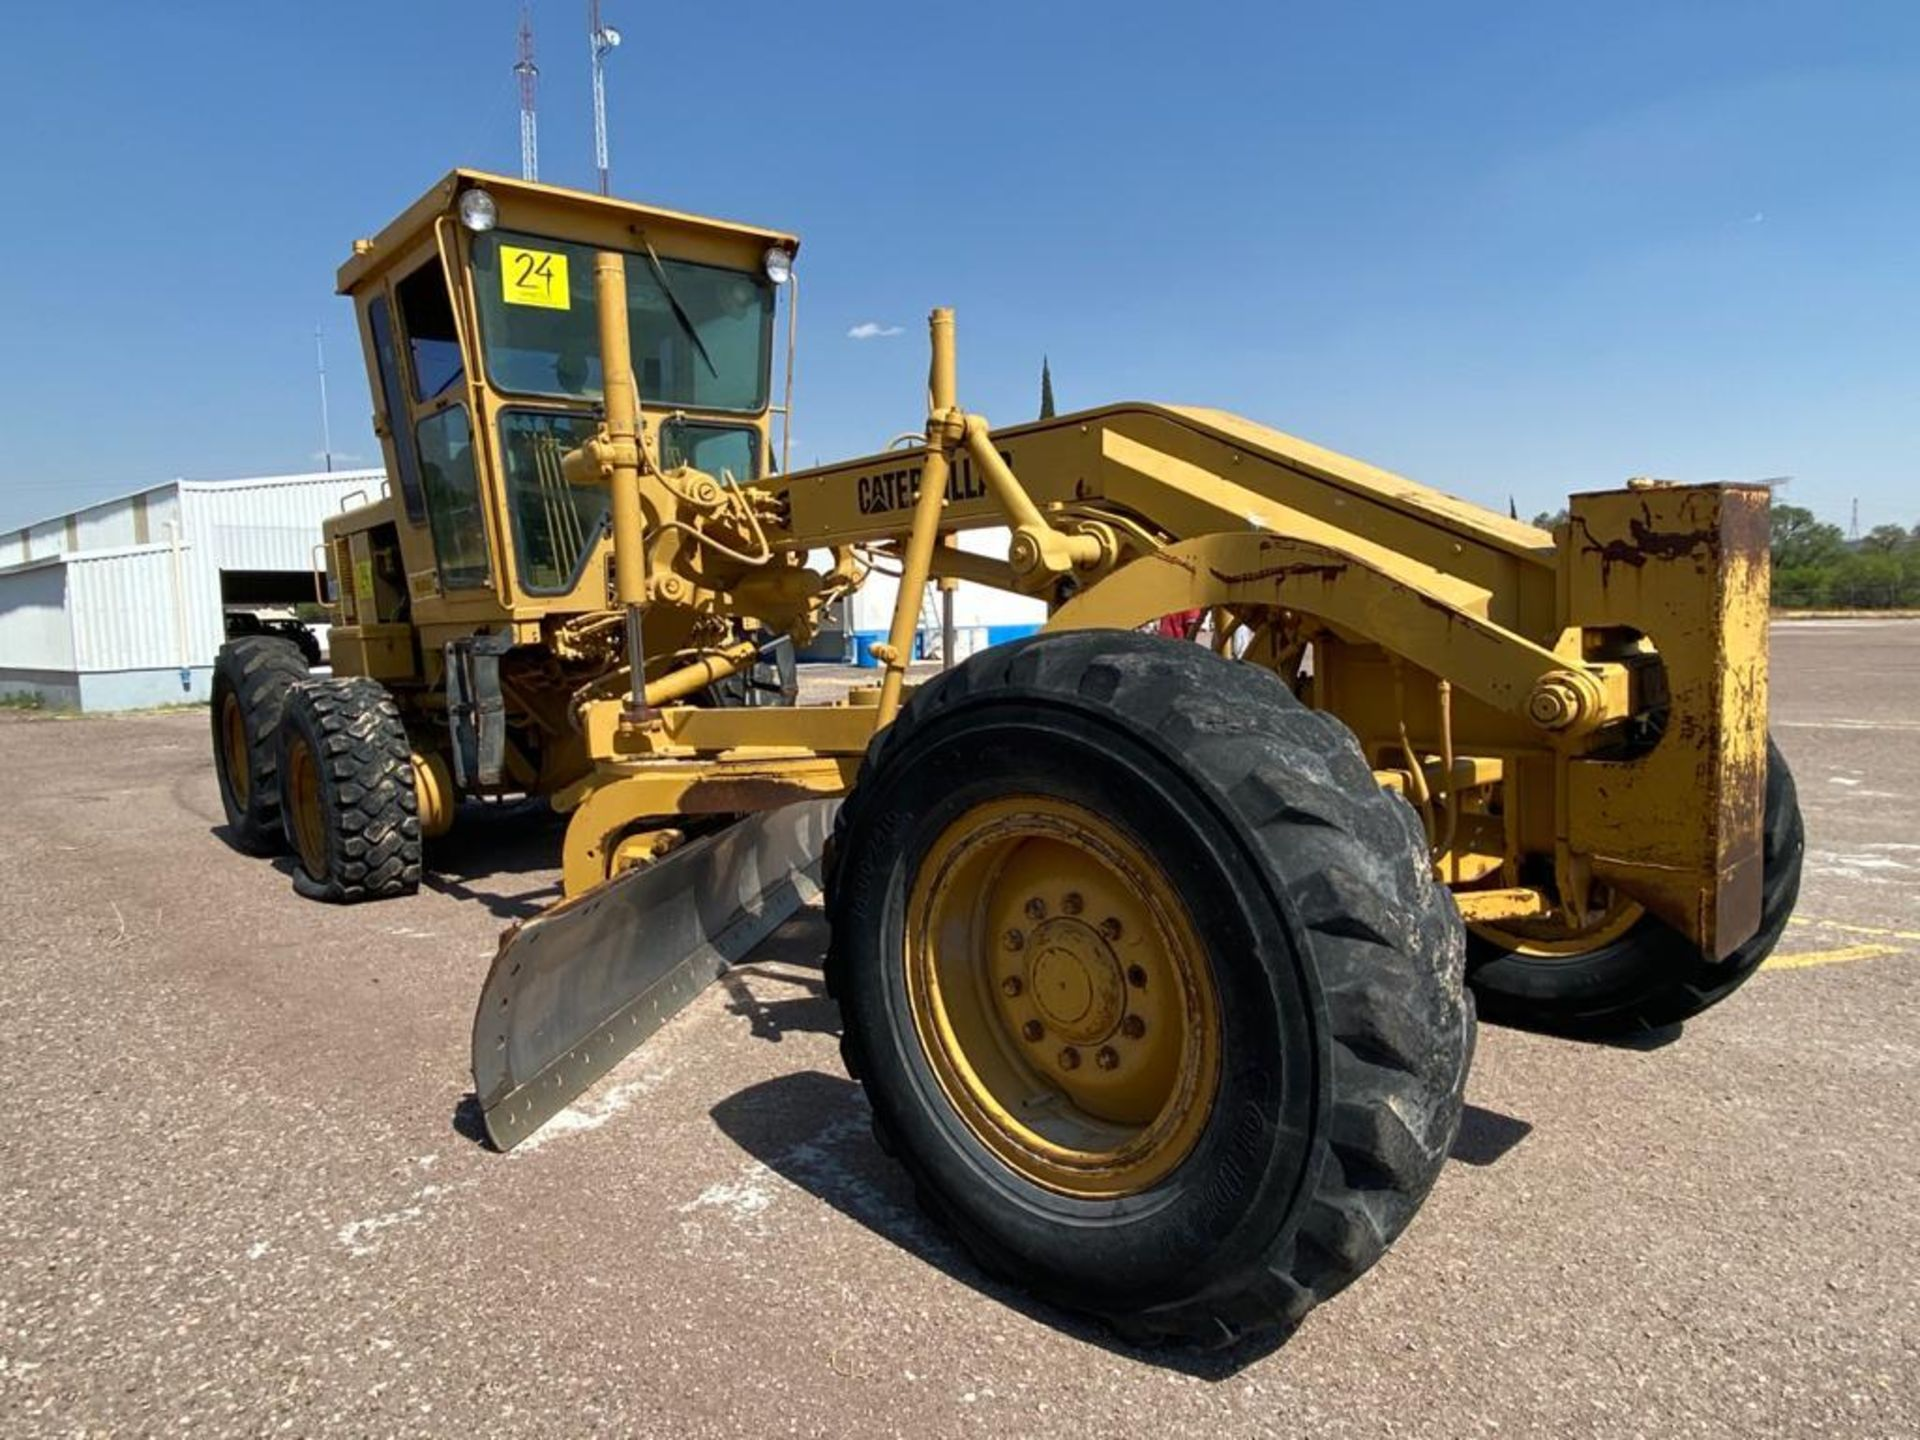 Caterpillar 120G Motor Grader, Serial number 87V09646, Motor number PQ883-2/07Z28983 - Image 3 of 61